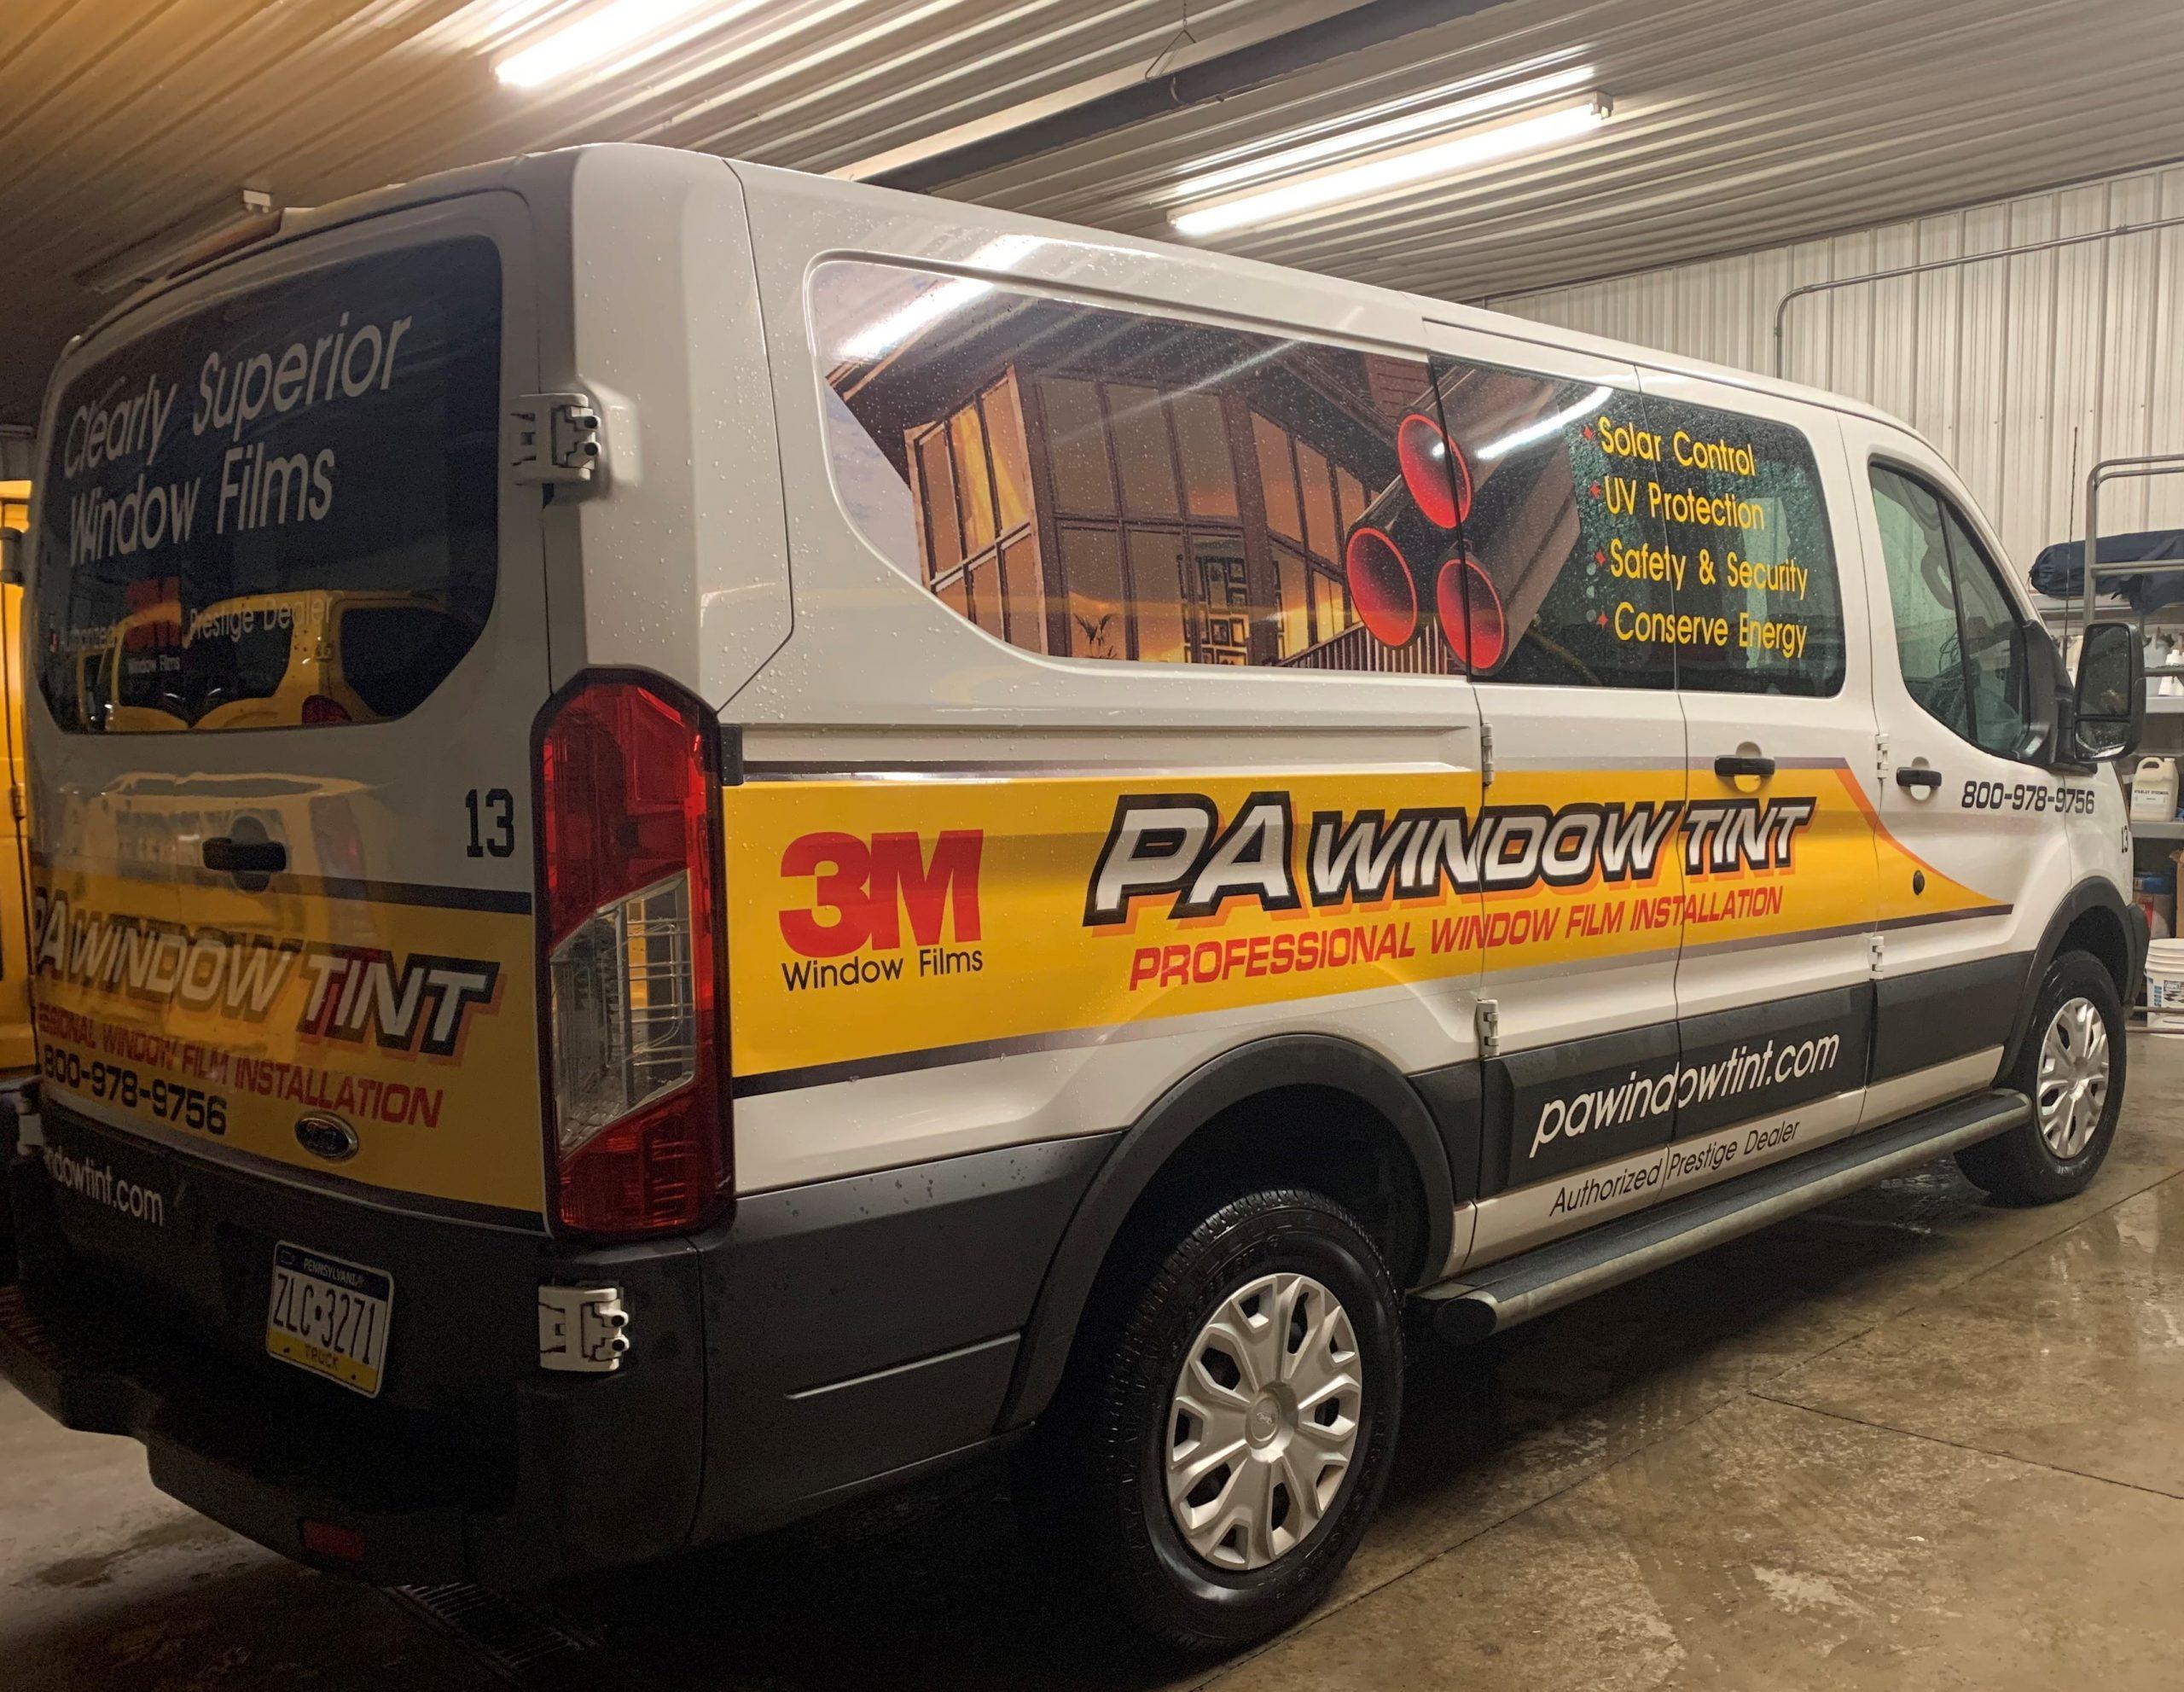 PA Window Tint van